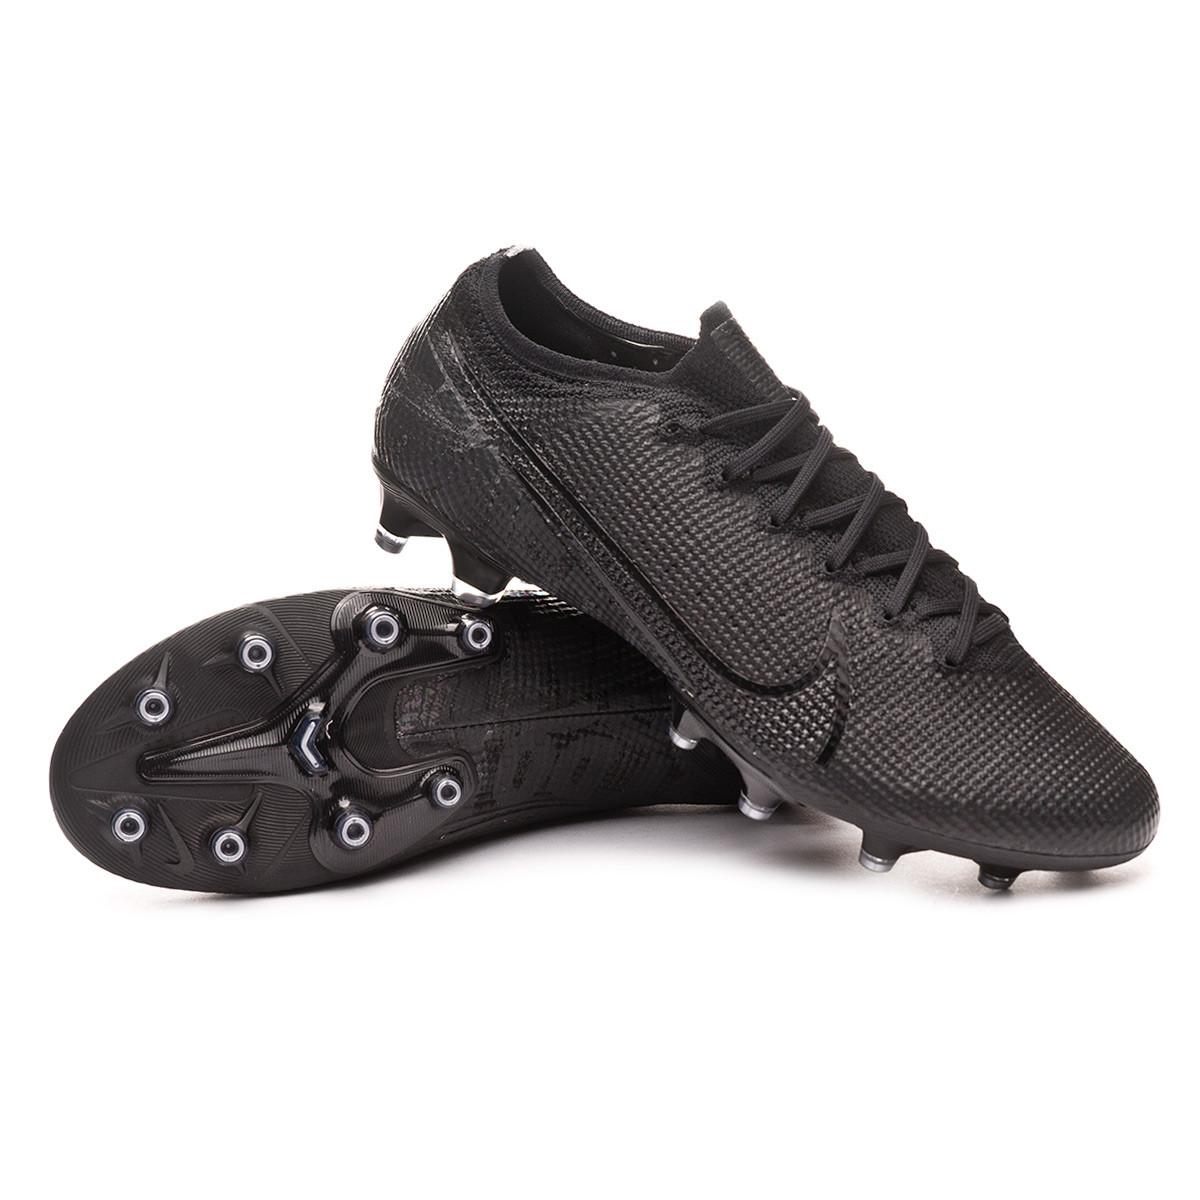 Saga termómetro asistente  Football Boots Nike Mercurial Vapor XIII Elite AG-Pro Black-Dark grey -  Football store Fútbol Emotion